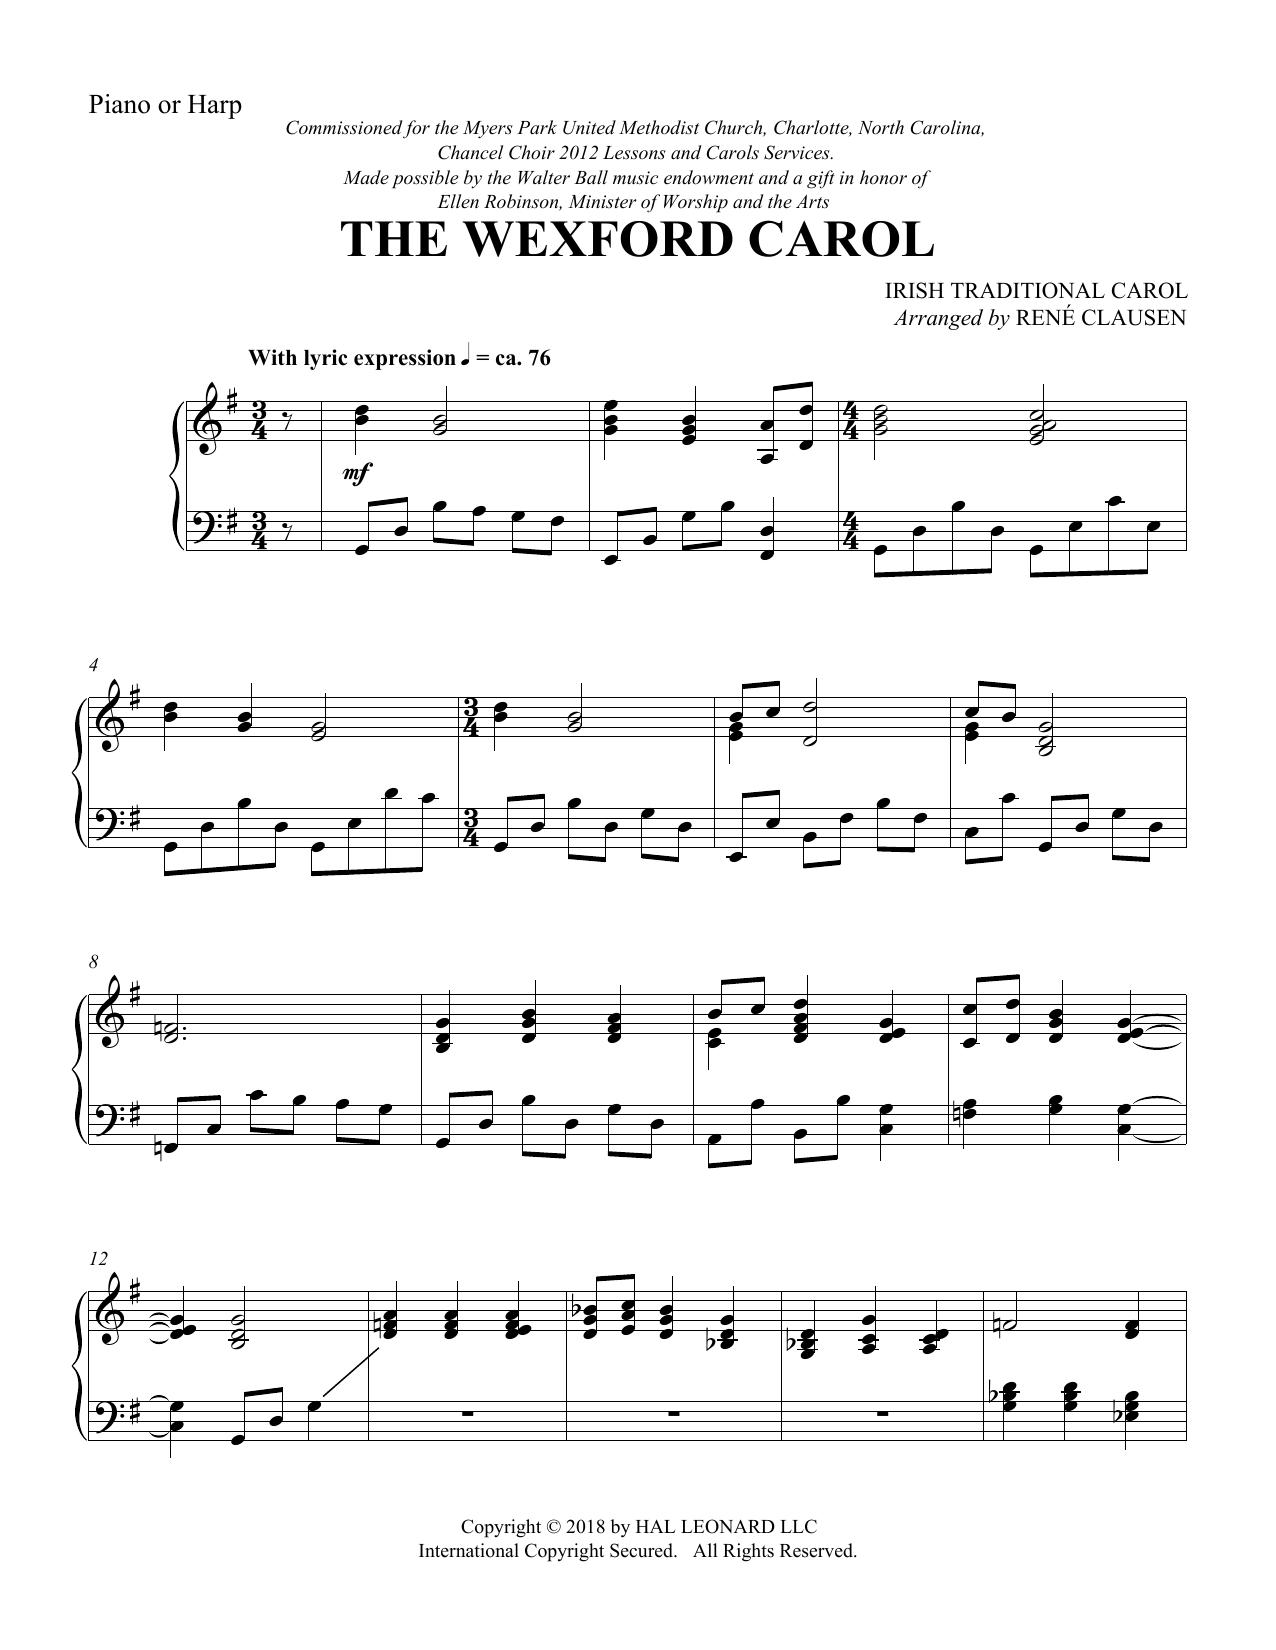 Traditional Irish Carol The Wexford Carol (arr. Rene Clausen) - Harp sheet music notes and chords